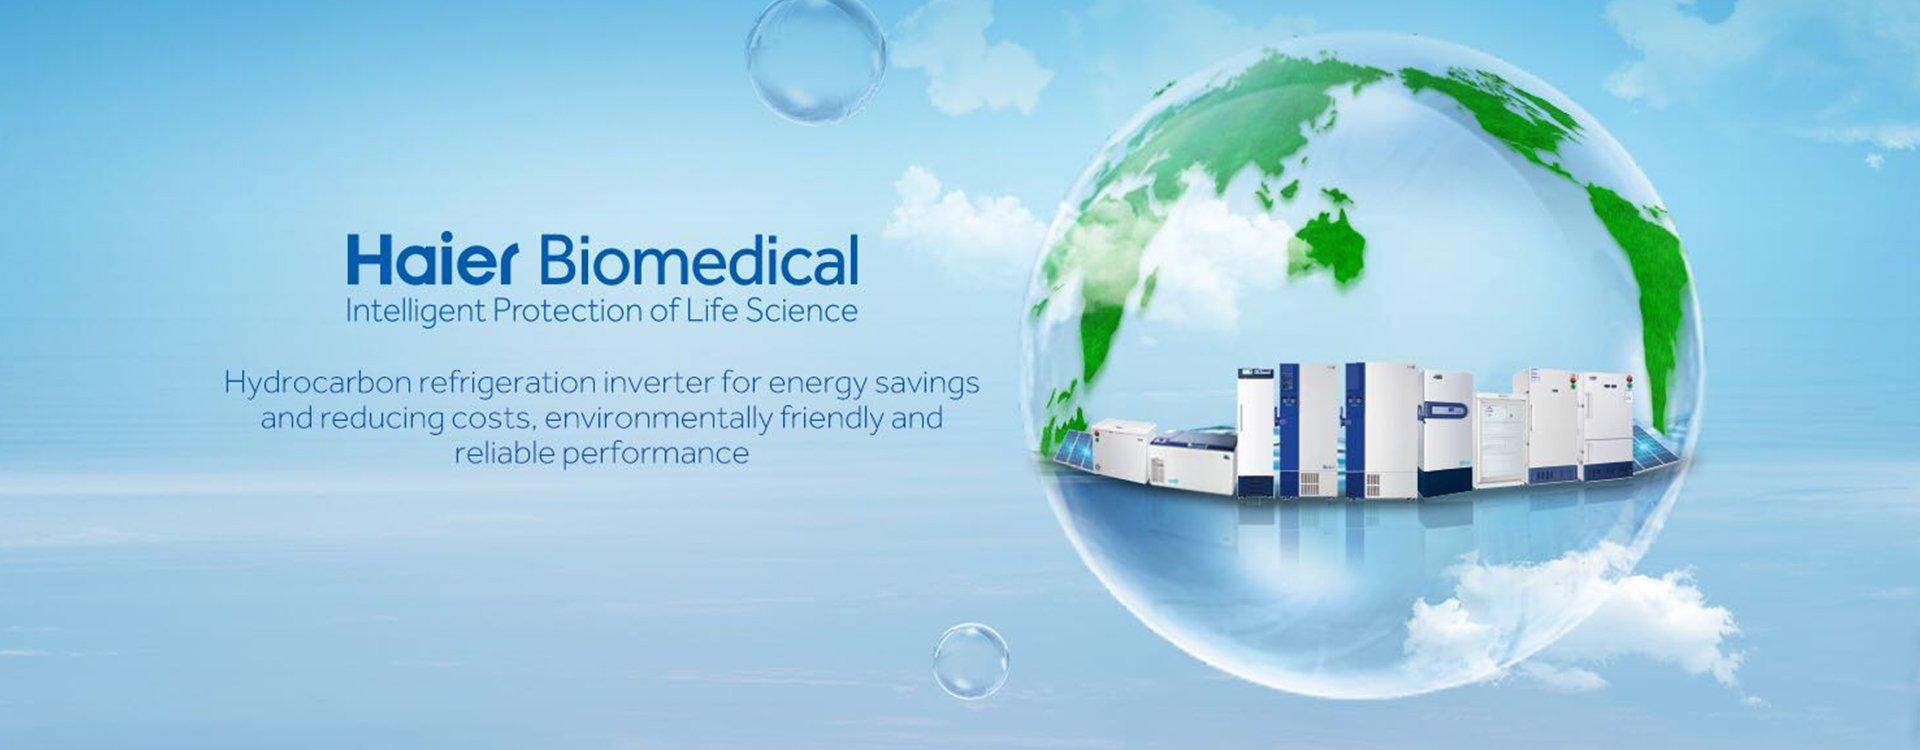 Haier Biomedical - Intelligent Protection of Life Science - Laboratuvar Cihaz ve Ürün Satışı